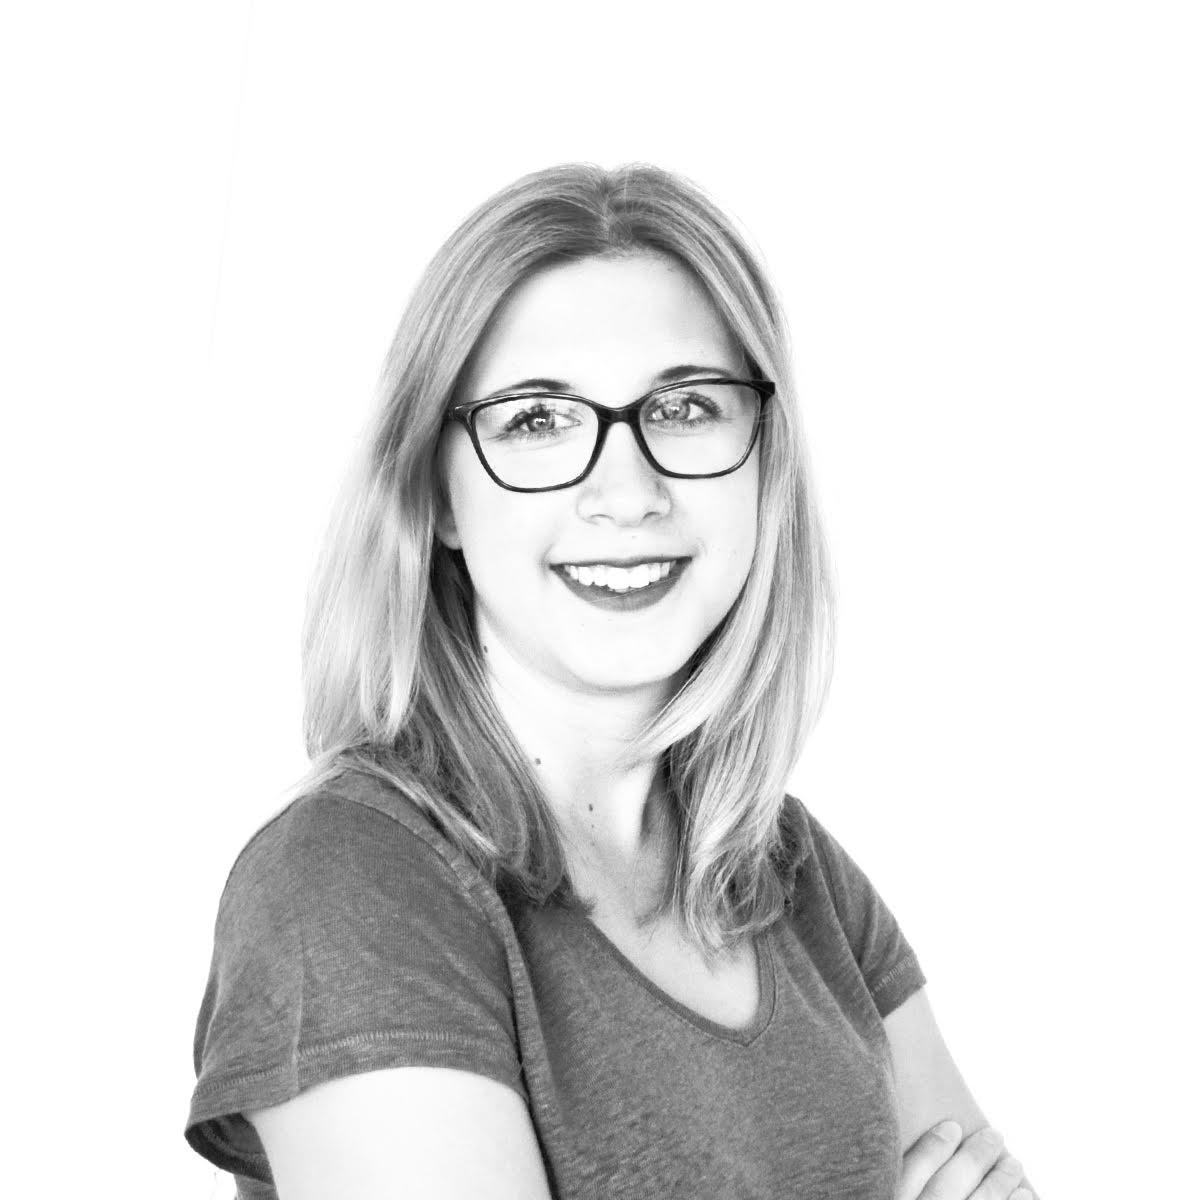 Lisa Otter-Krohnen